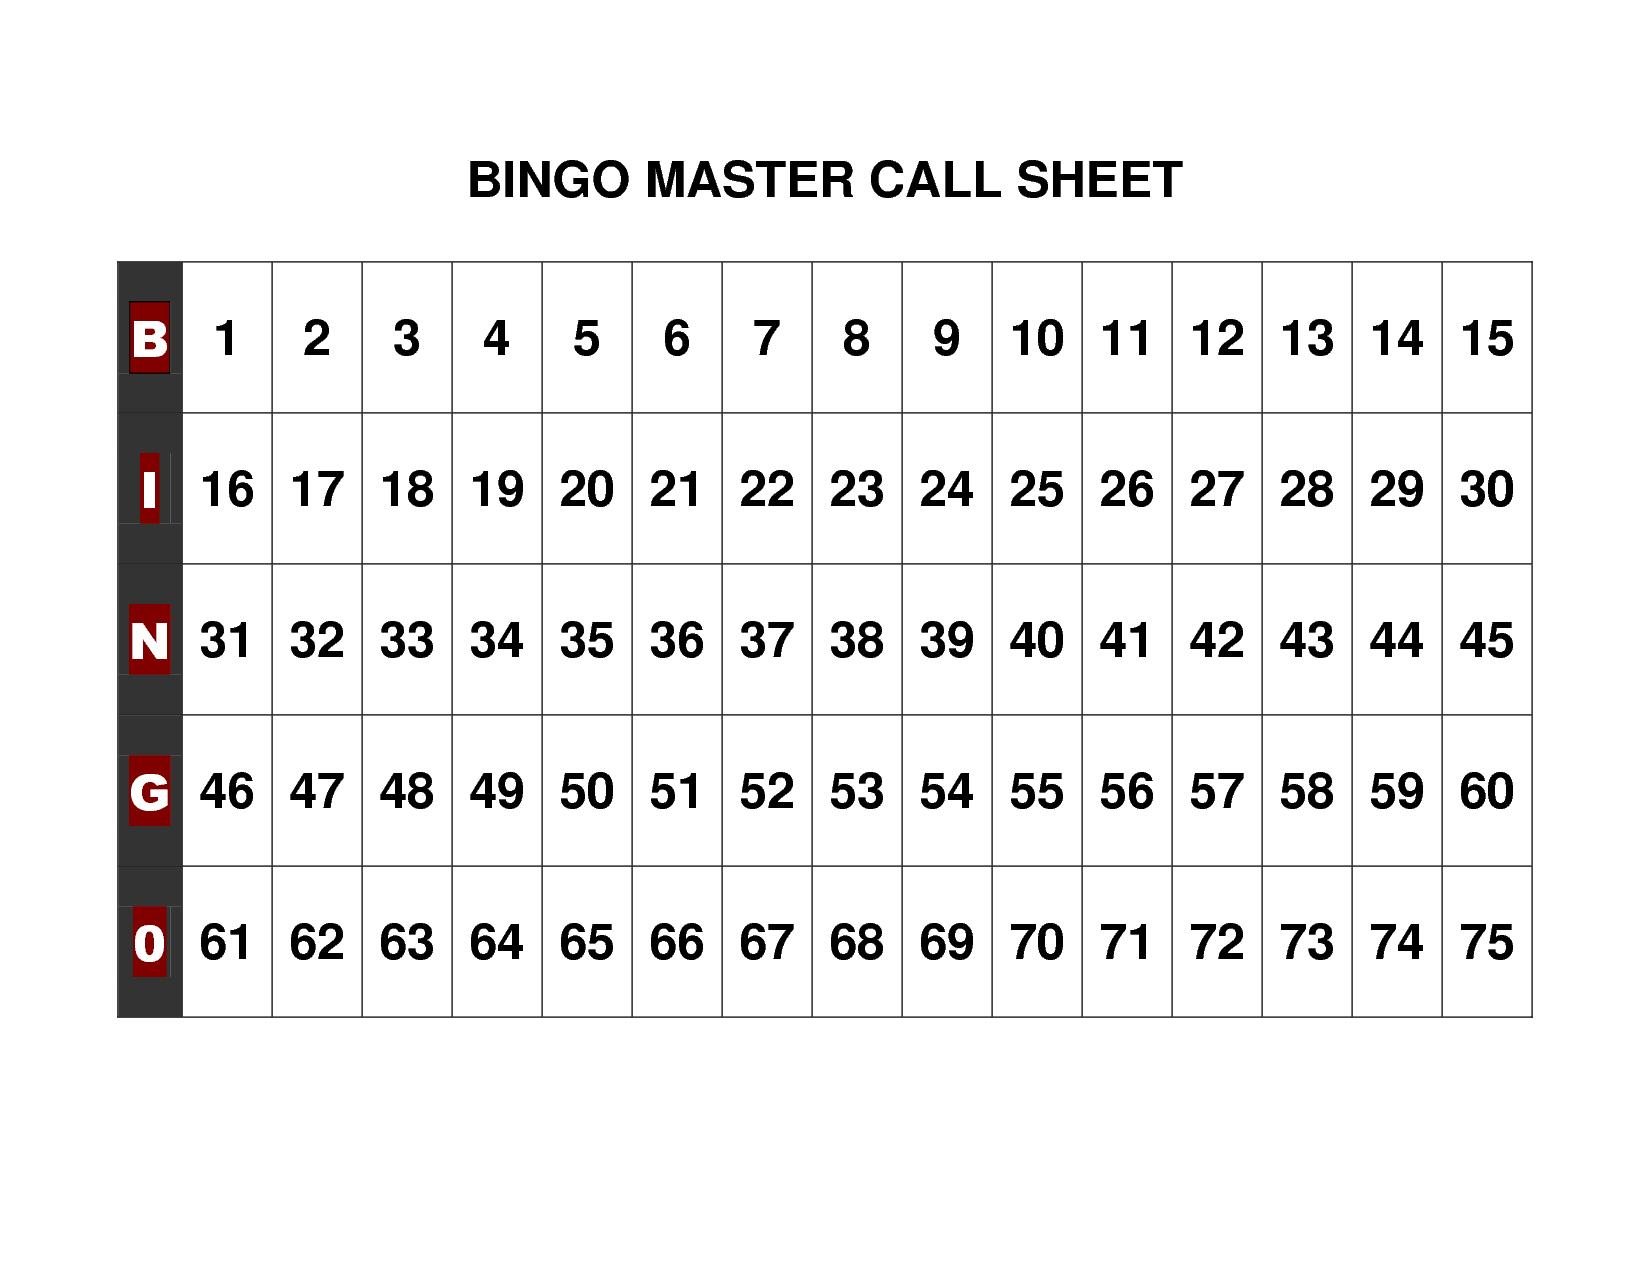 Free+Printable+Bingo+Call+Sheet | Bingo | Bingo Calls, Free - Free Printable Bingo Cards 1 100